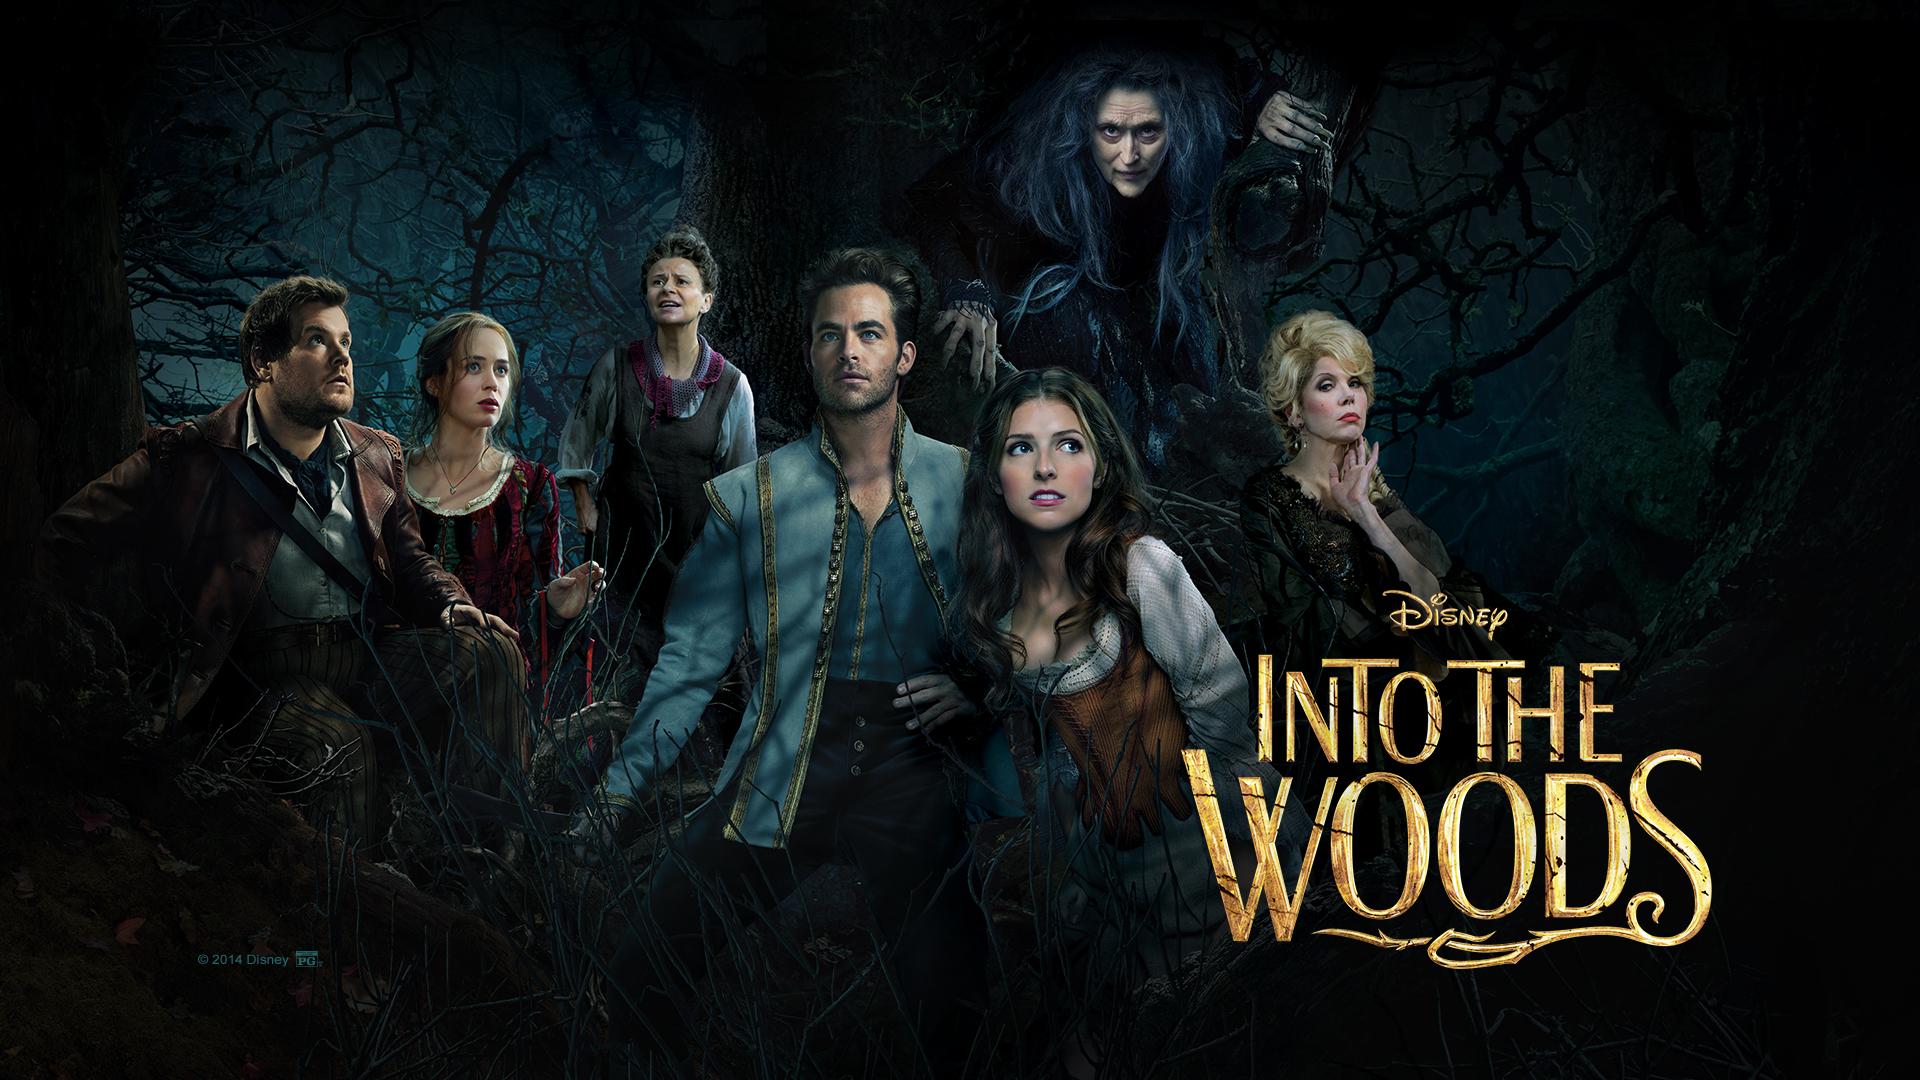 Into the Woods, Johnny Deep e Meryl Streep nella nuova favola Disney